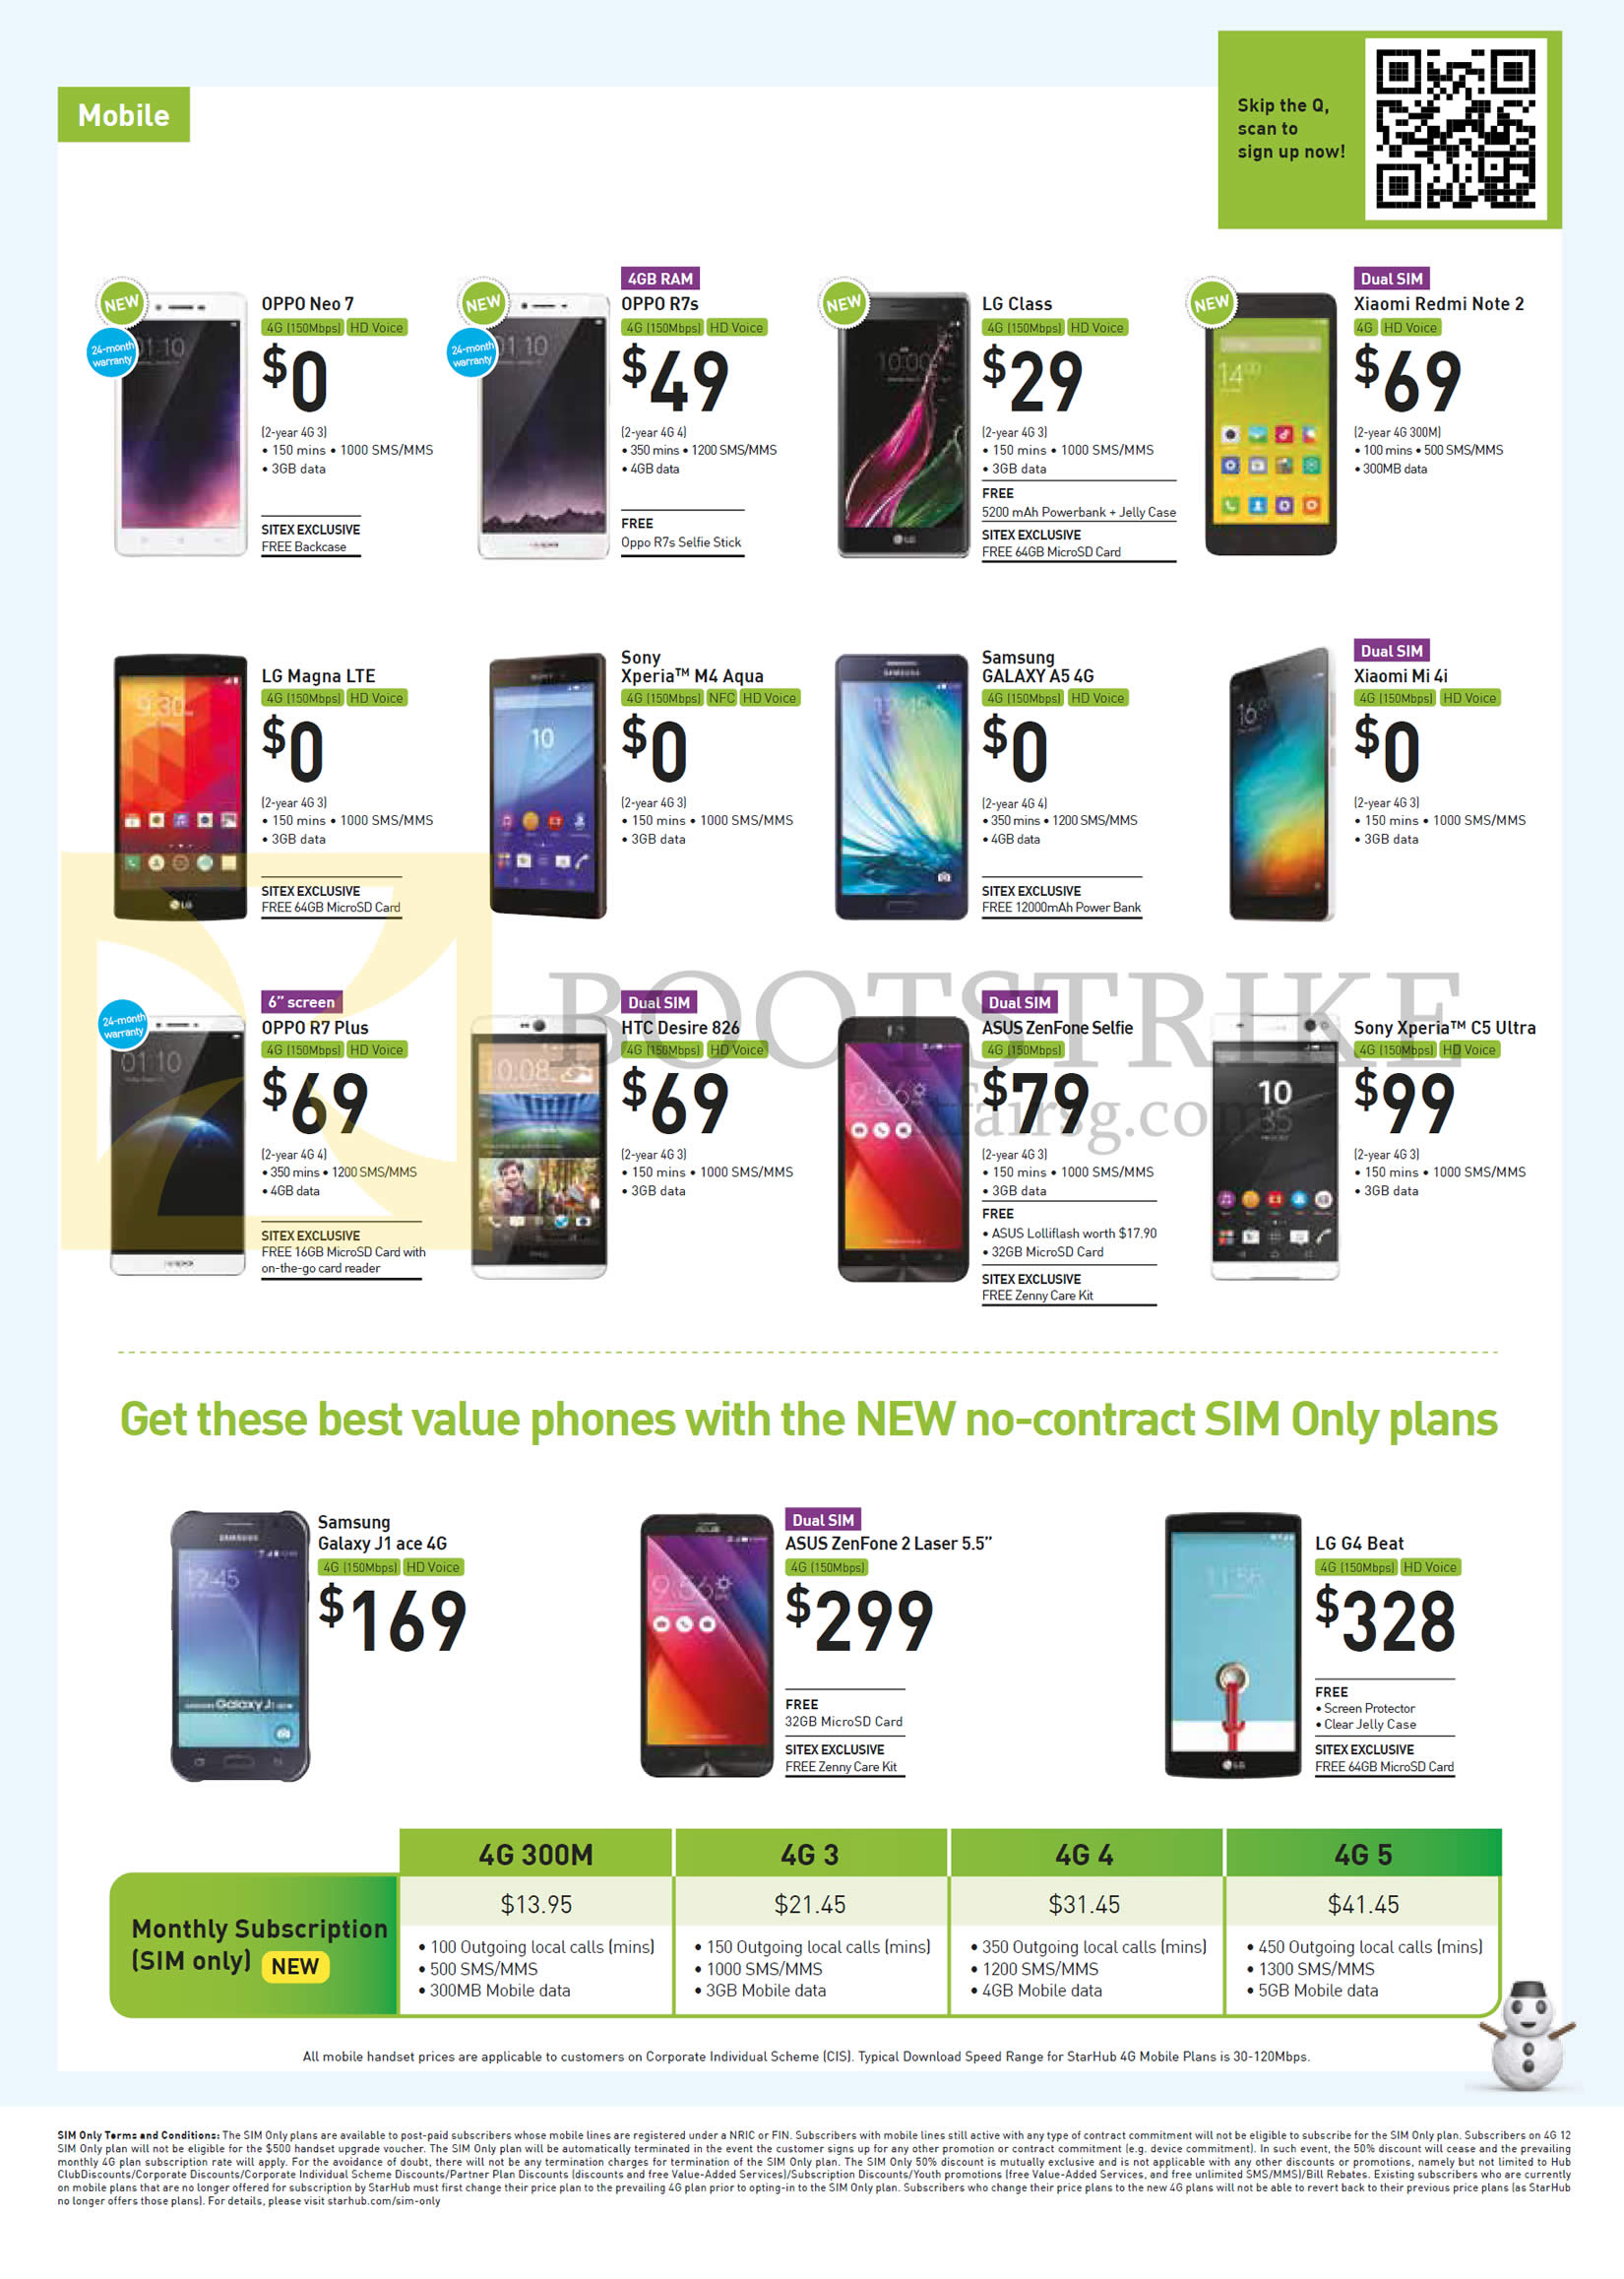 SITEX 2015 price list image brochure of Starhub Mobile Phones, Sim Only Plans, Oppo Neo 7, R7s, R7 Plus, LG Class, Magna LTE, G4 Beat, Xiaomi Redmi Note 2, Mi 4i, Sony Xperia M4 Aqua, C5 Ultra, HTC Desire 826, Asus Zenfone Selfie, 2 Laser 5.5